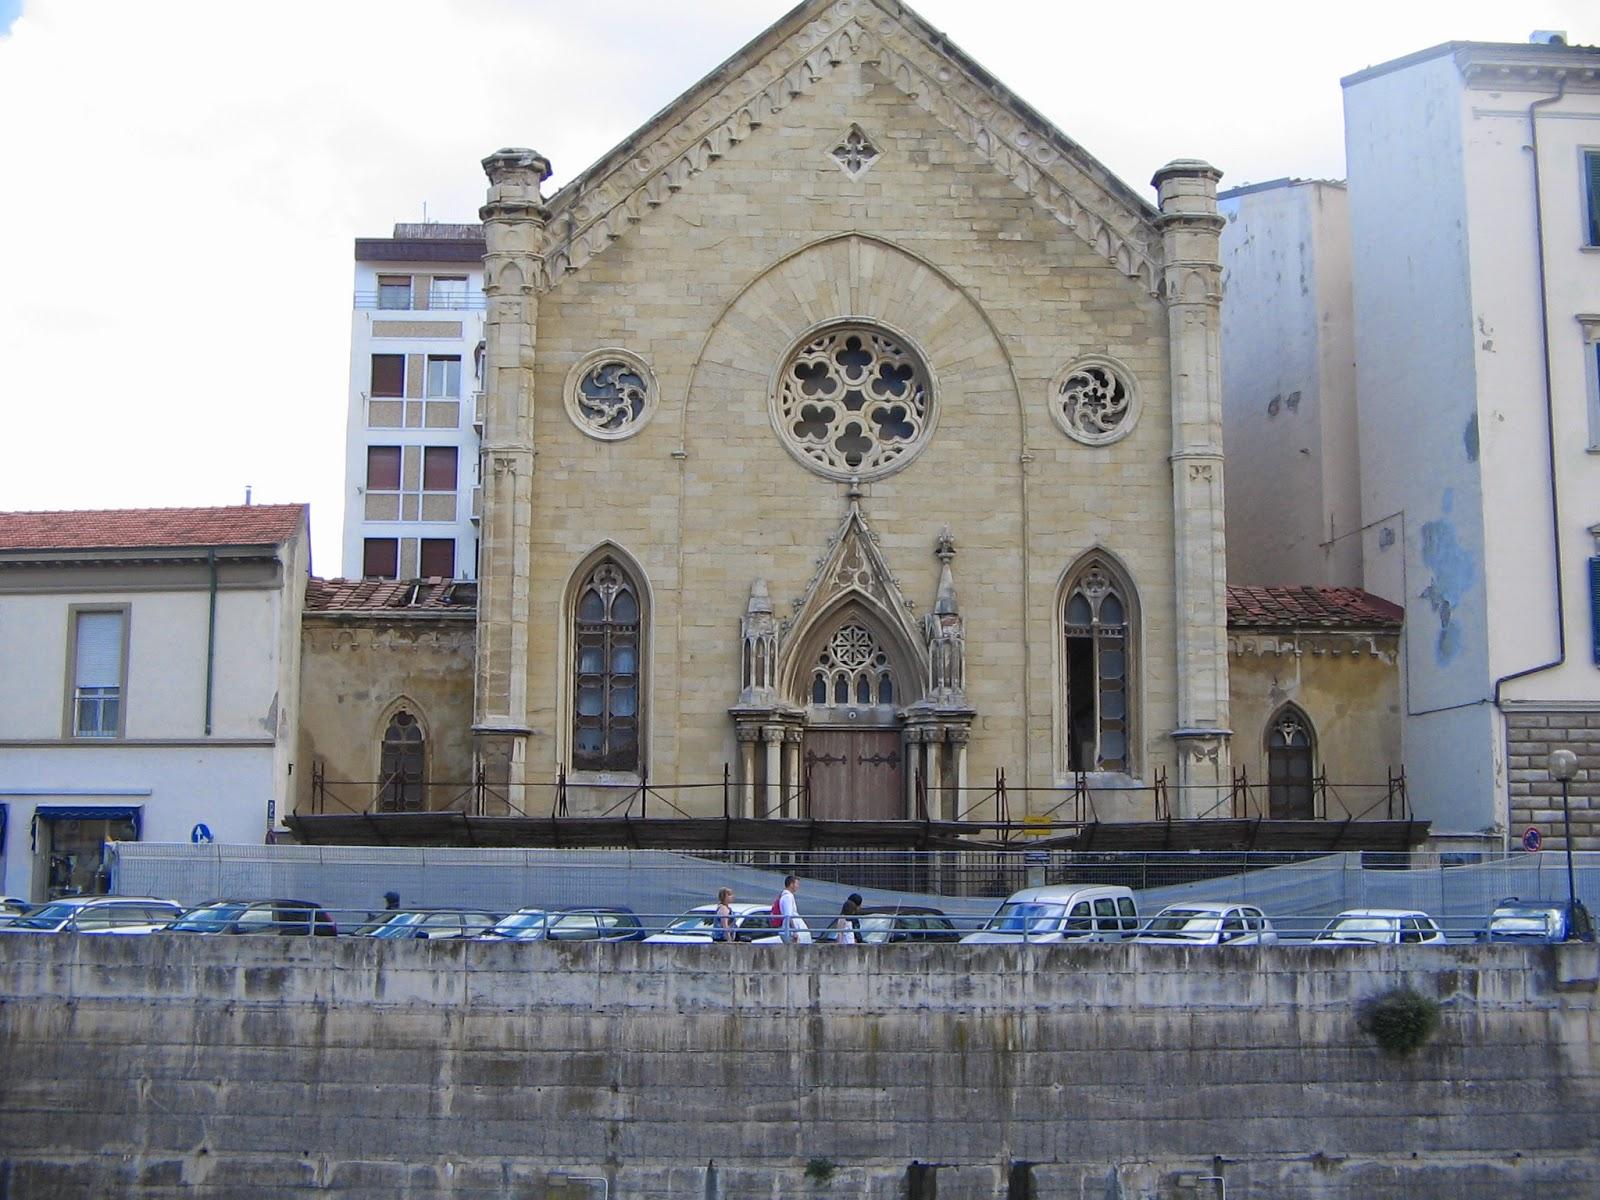 De Hollandse kerk